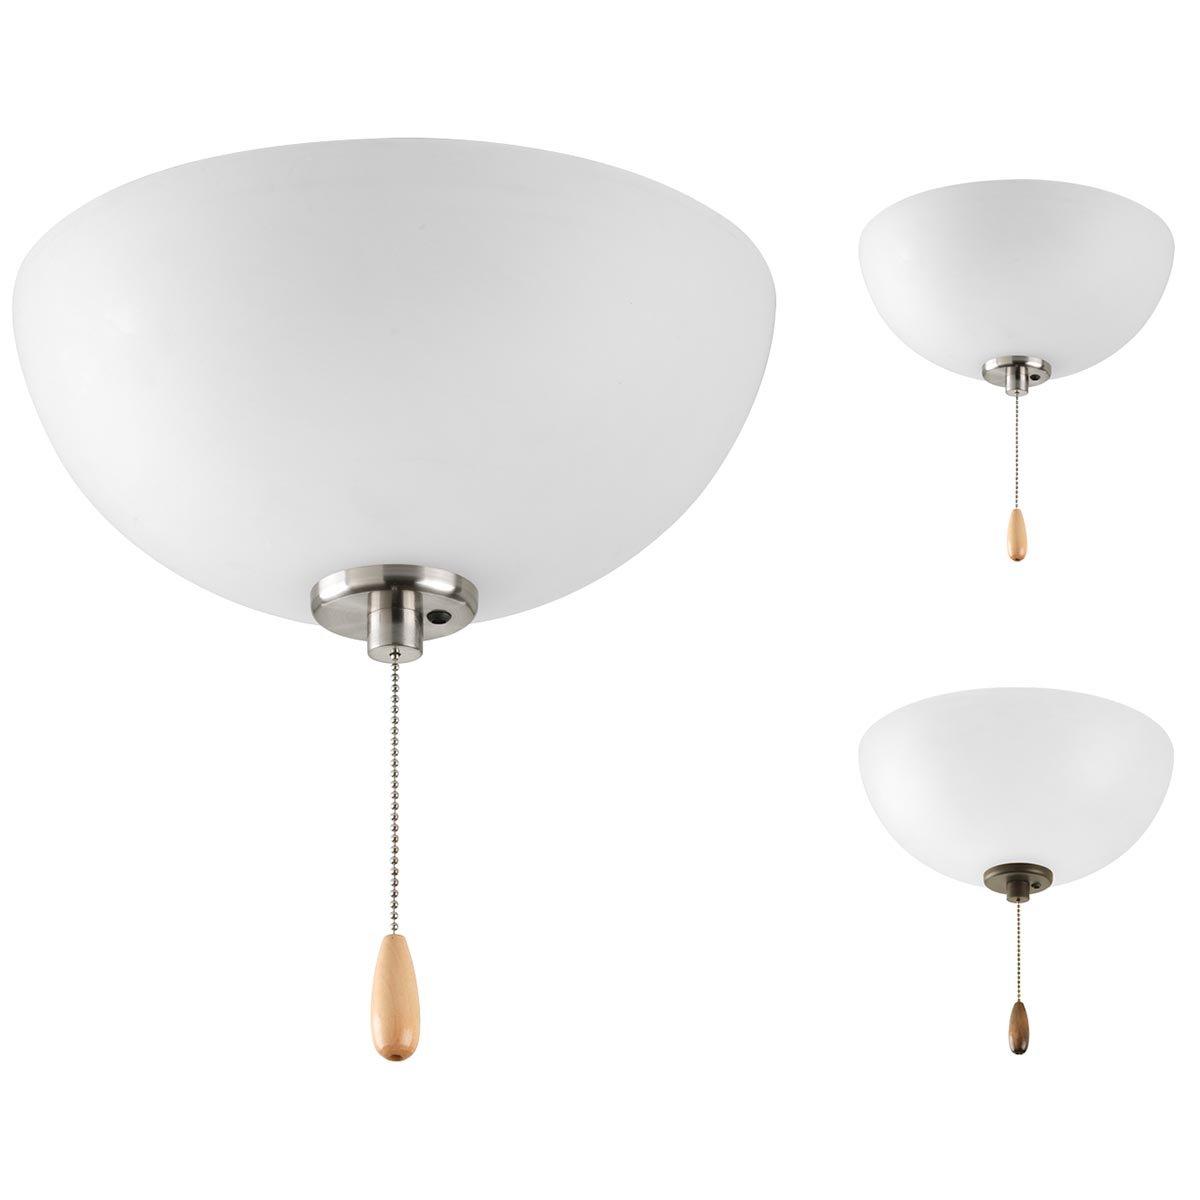 Progress Lighting P2650-01WB Fan Light Kit, Unfinished